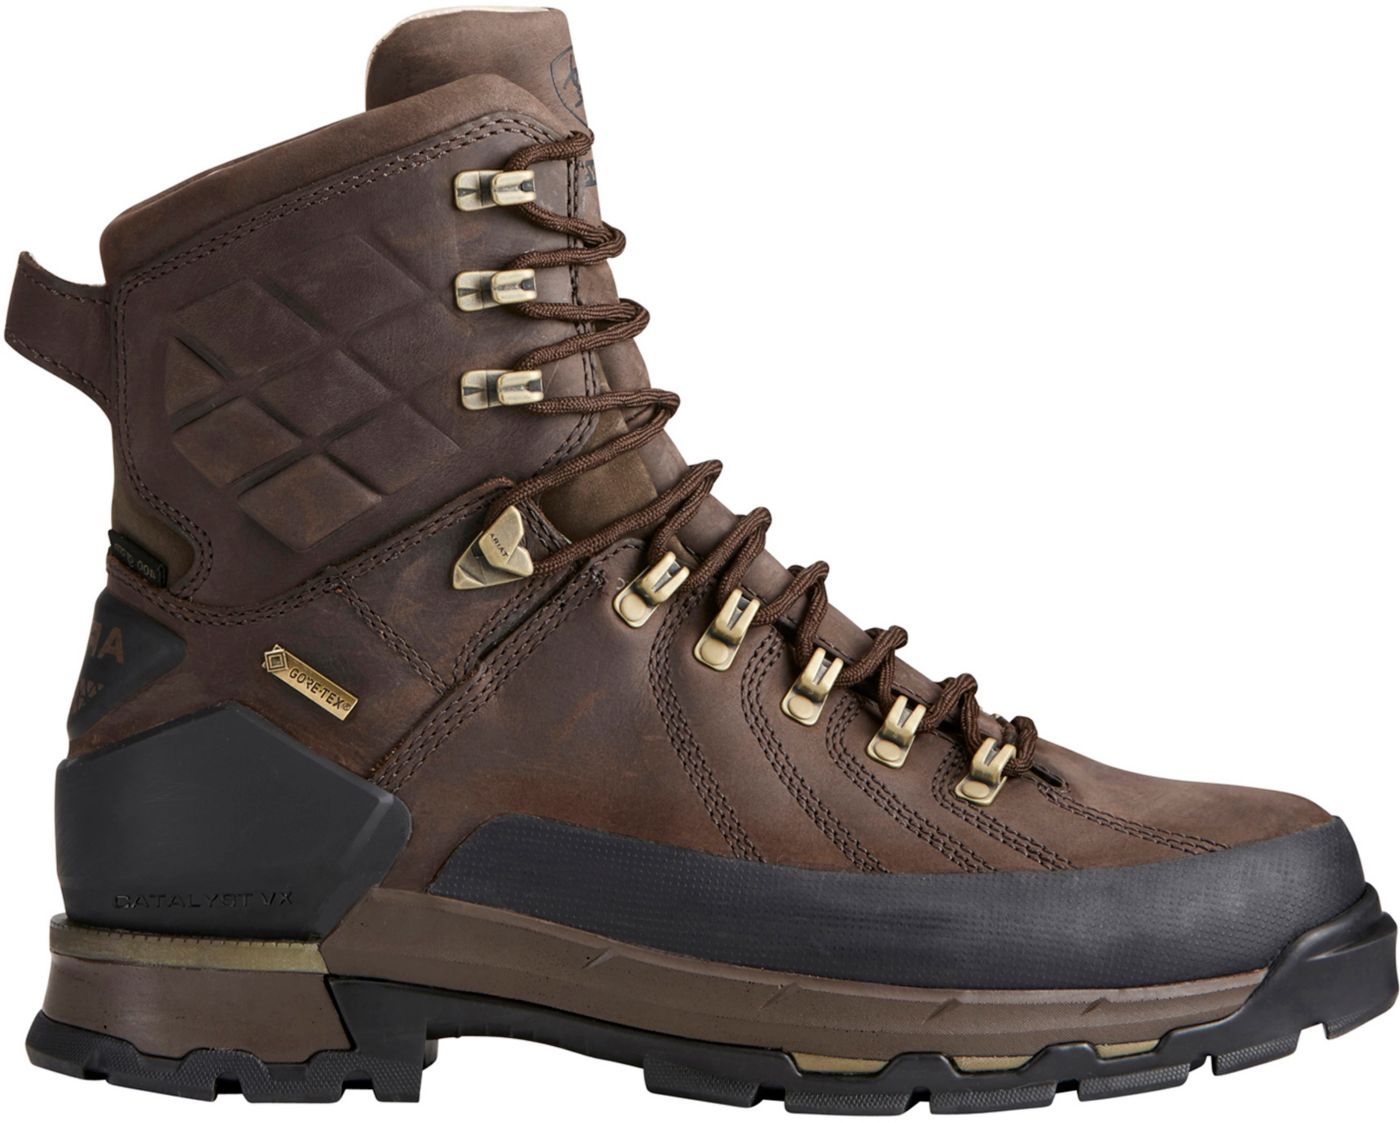 Ariat Men's Catalyst Defiant 8'' 400g GORE-TEX Field Hunting Boots